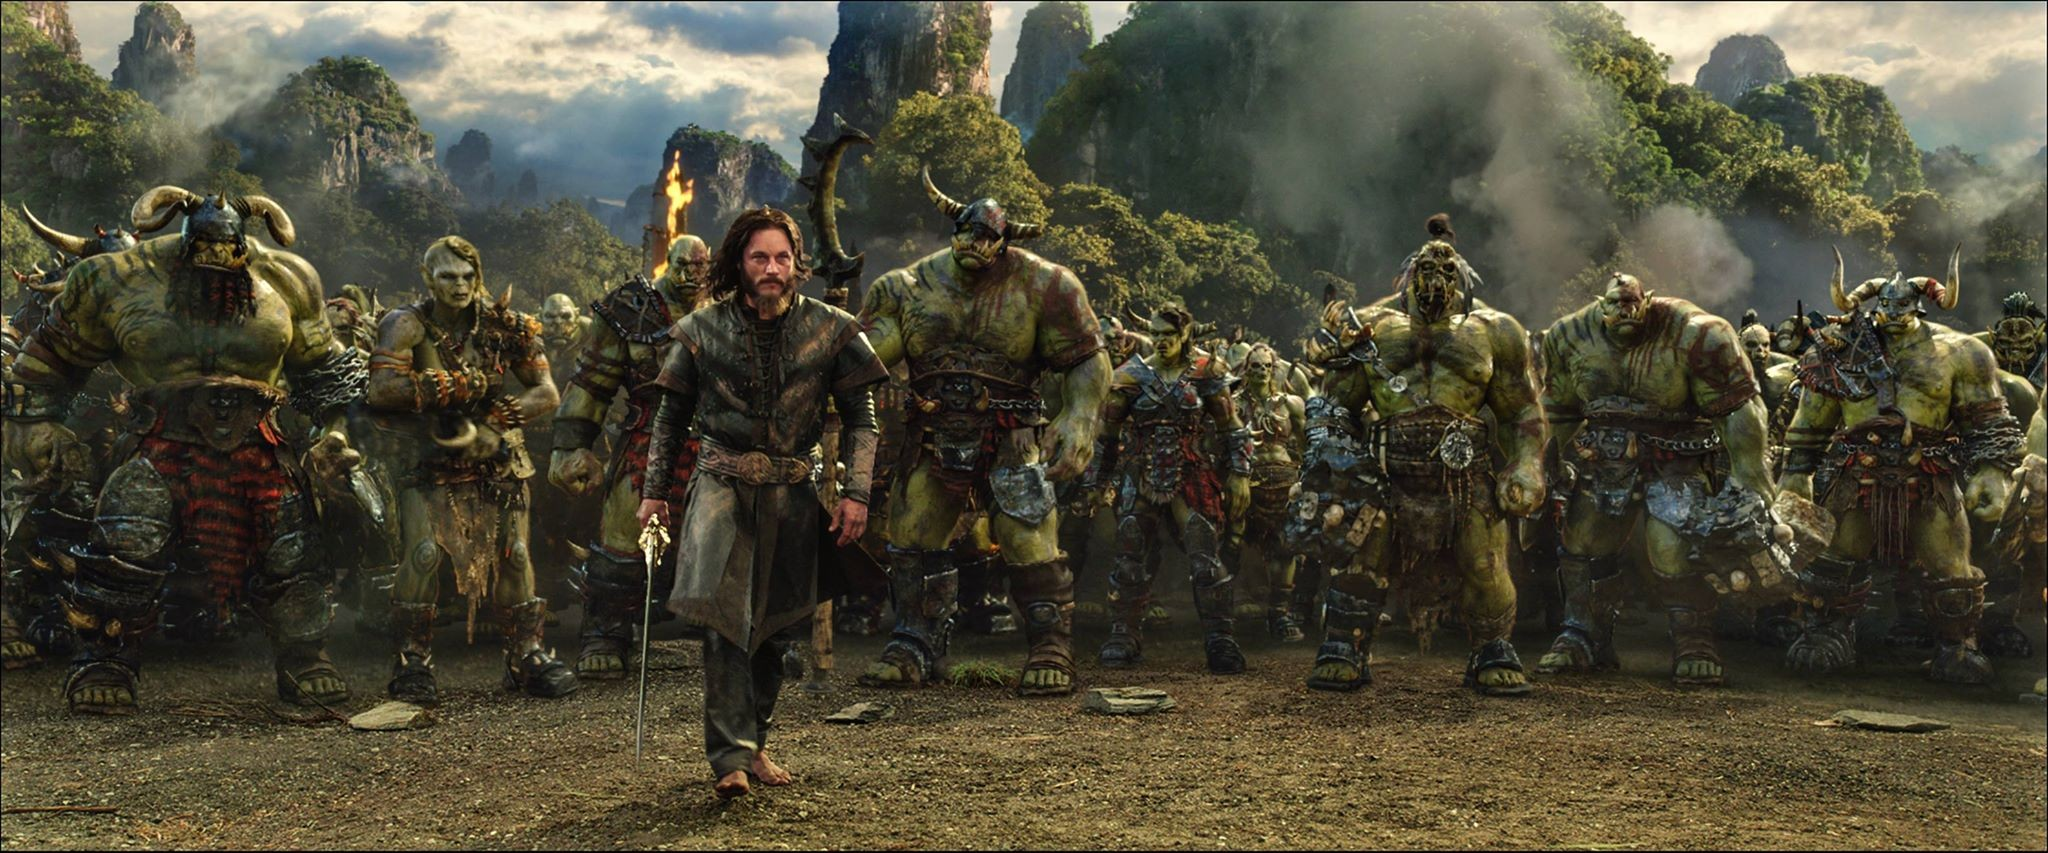 People 2048x853 Warcraft movies Fantasy Men screen shot orcs